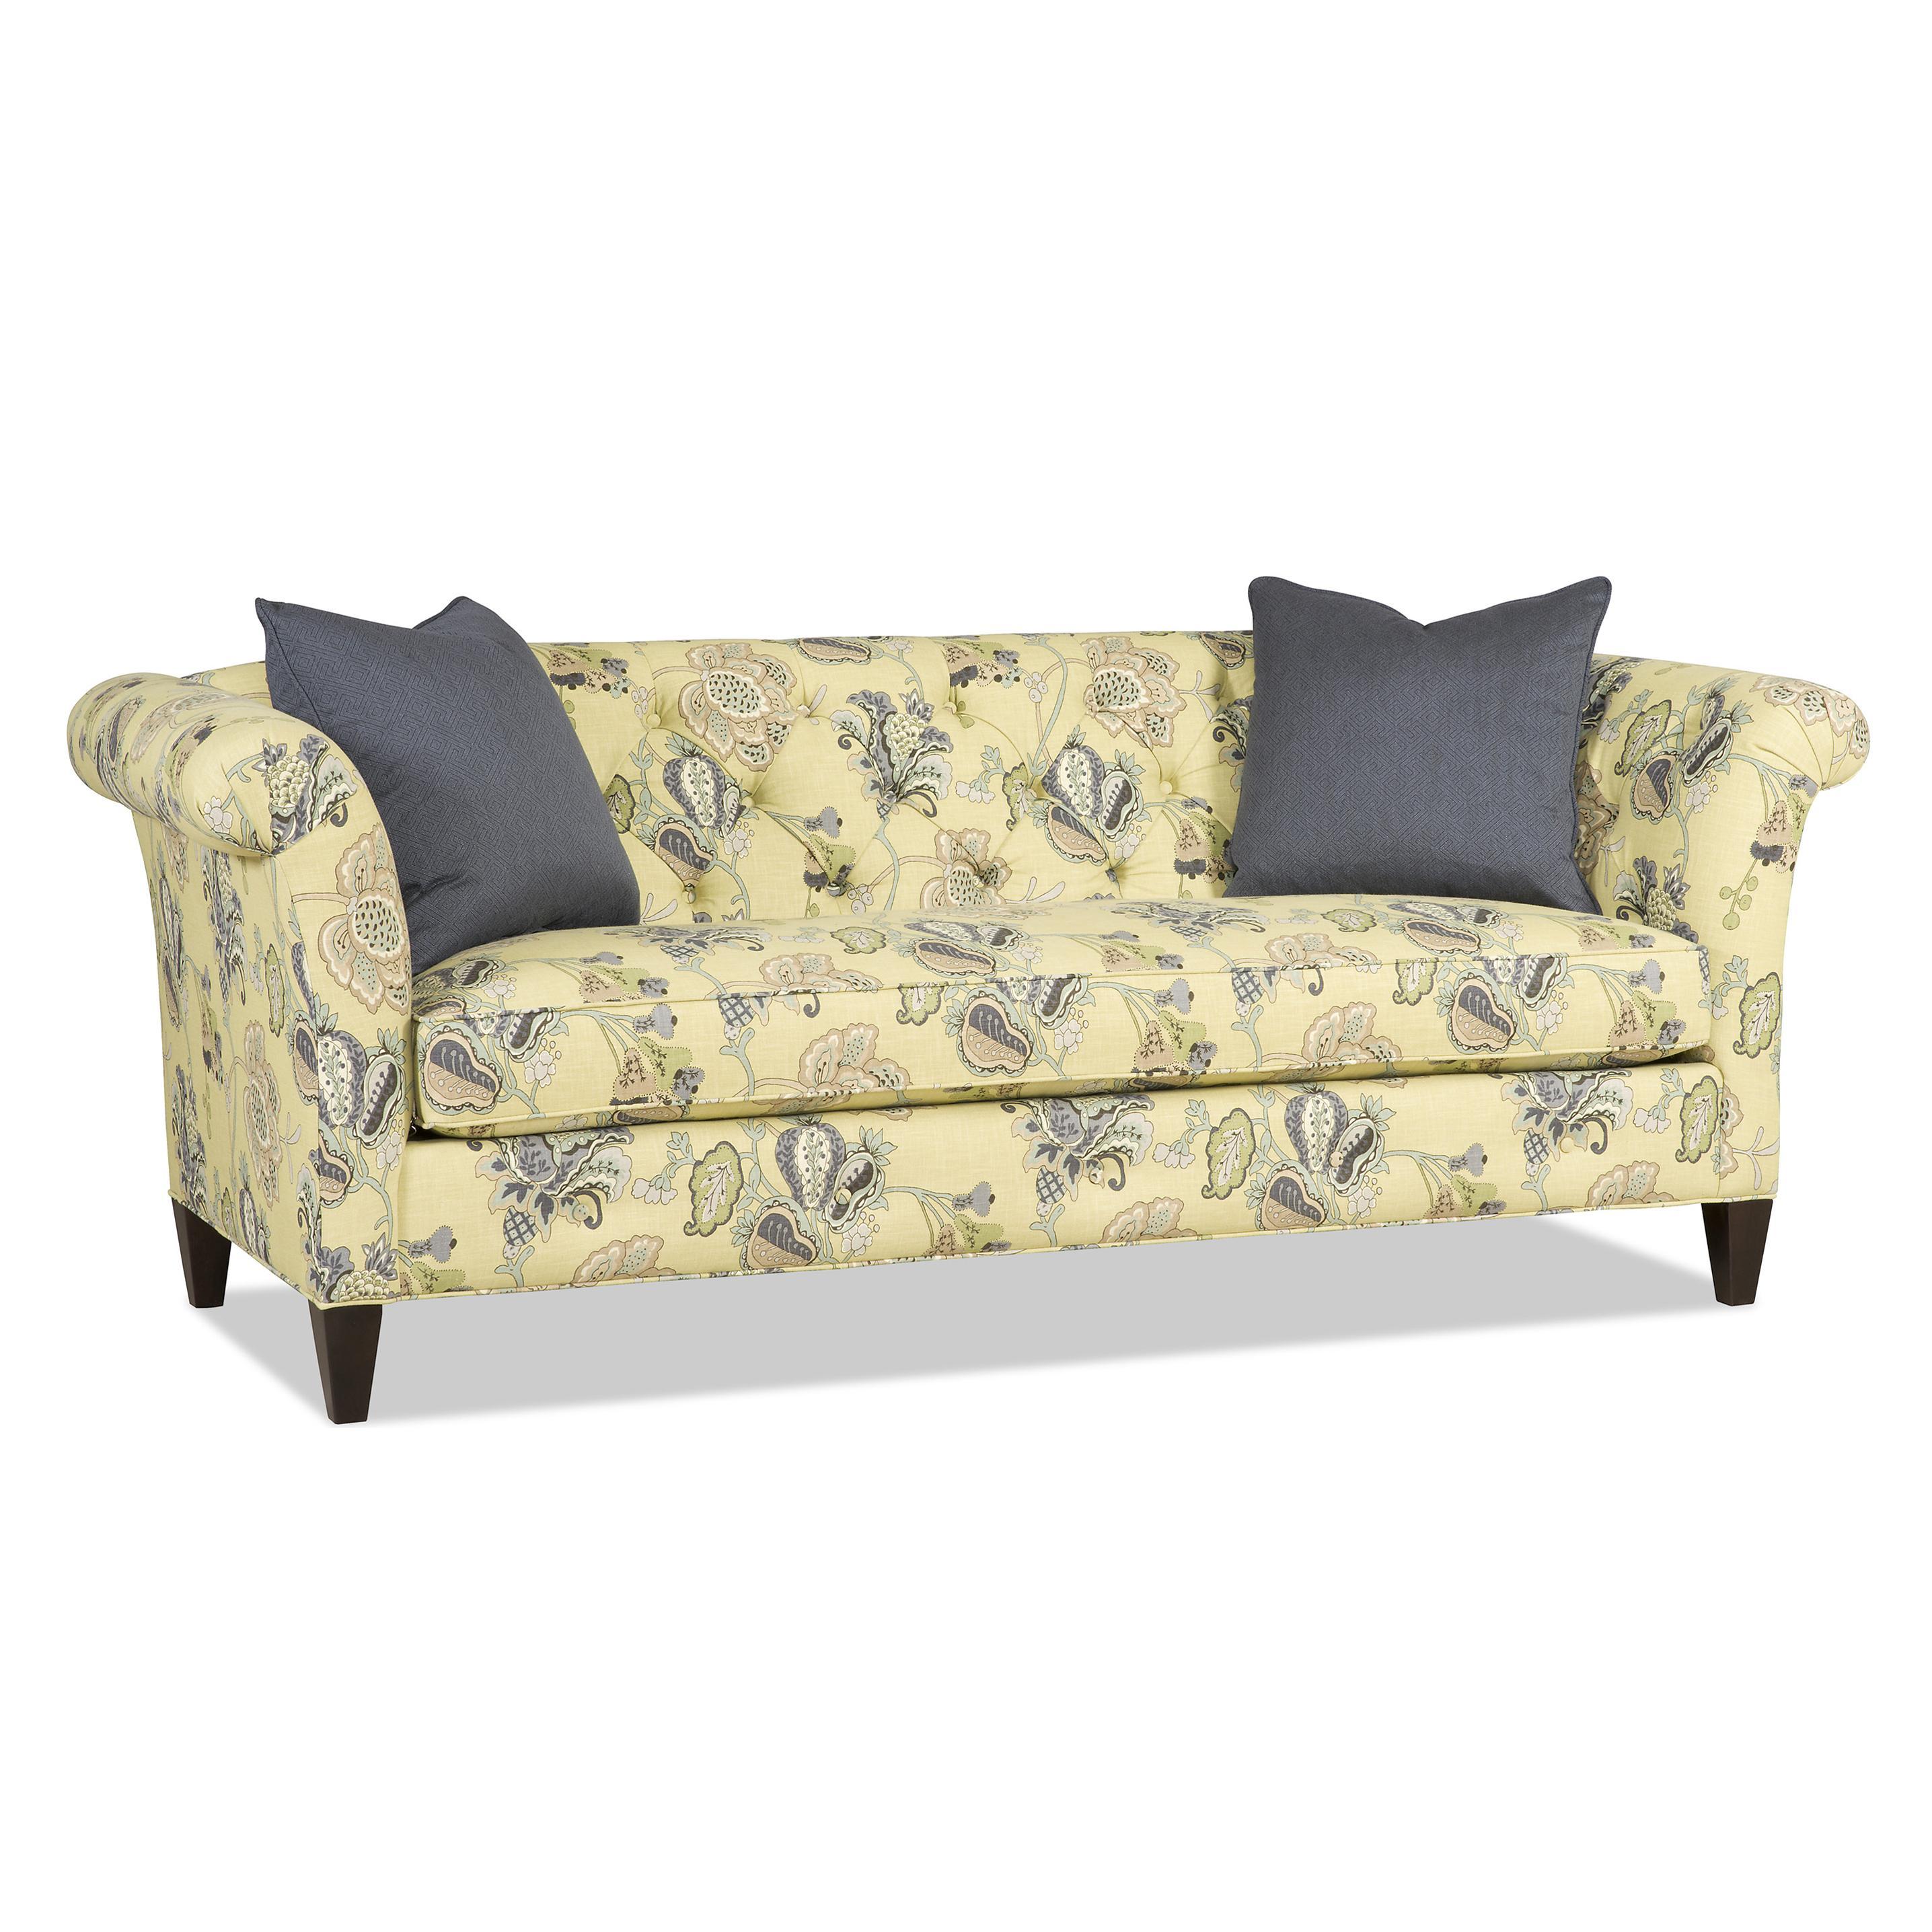 emma tufted sofa frame construction sam moore sofas living room crawford 3 over